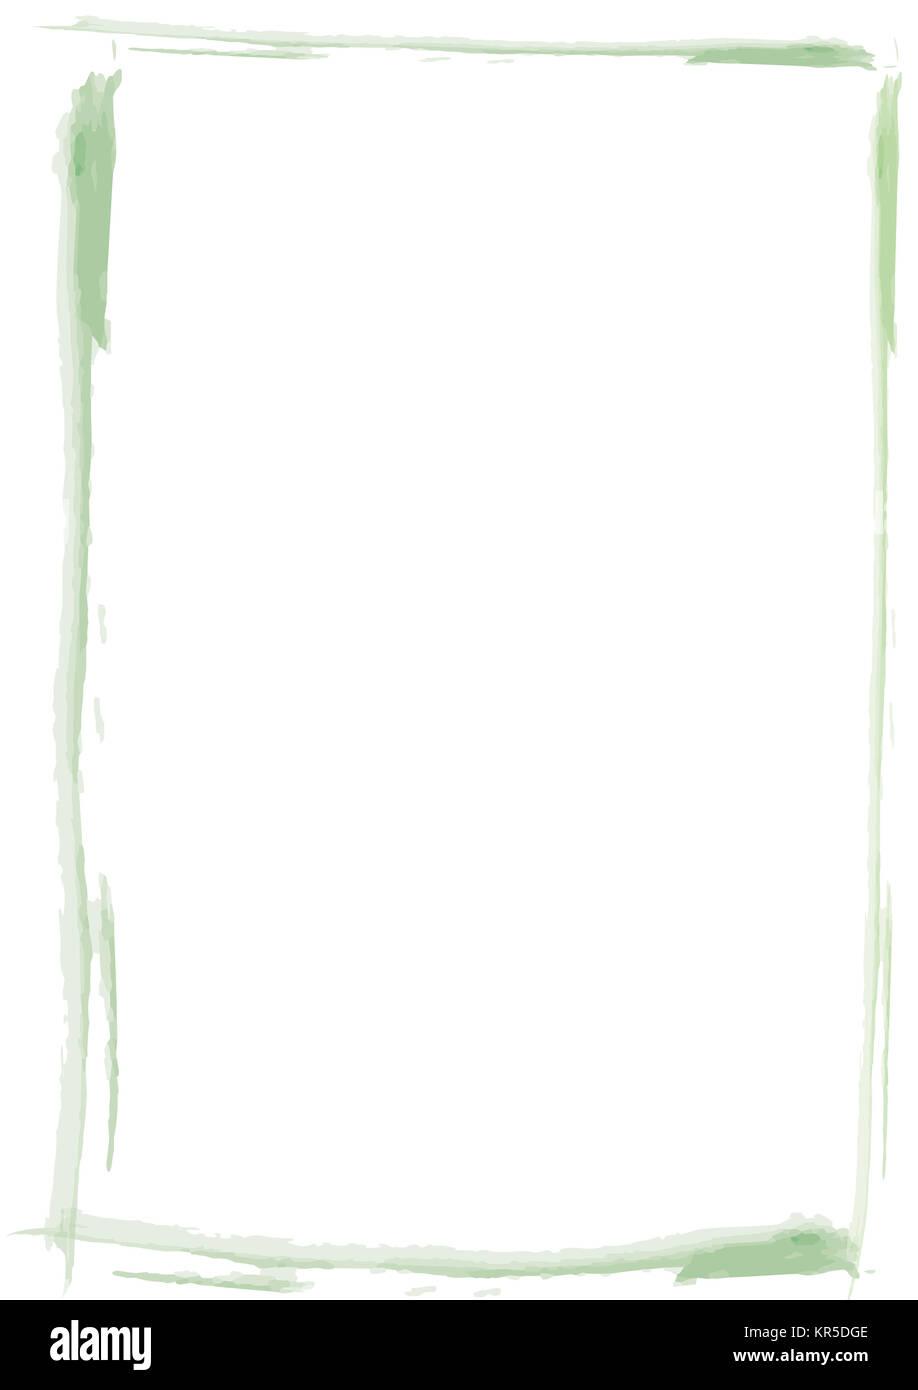 Rahmen Pinsel Strich grün Stock Photo: 169150814 - Alamy